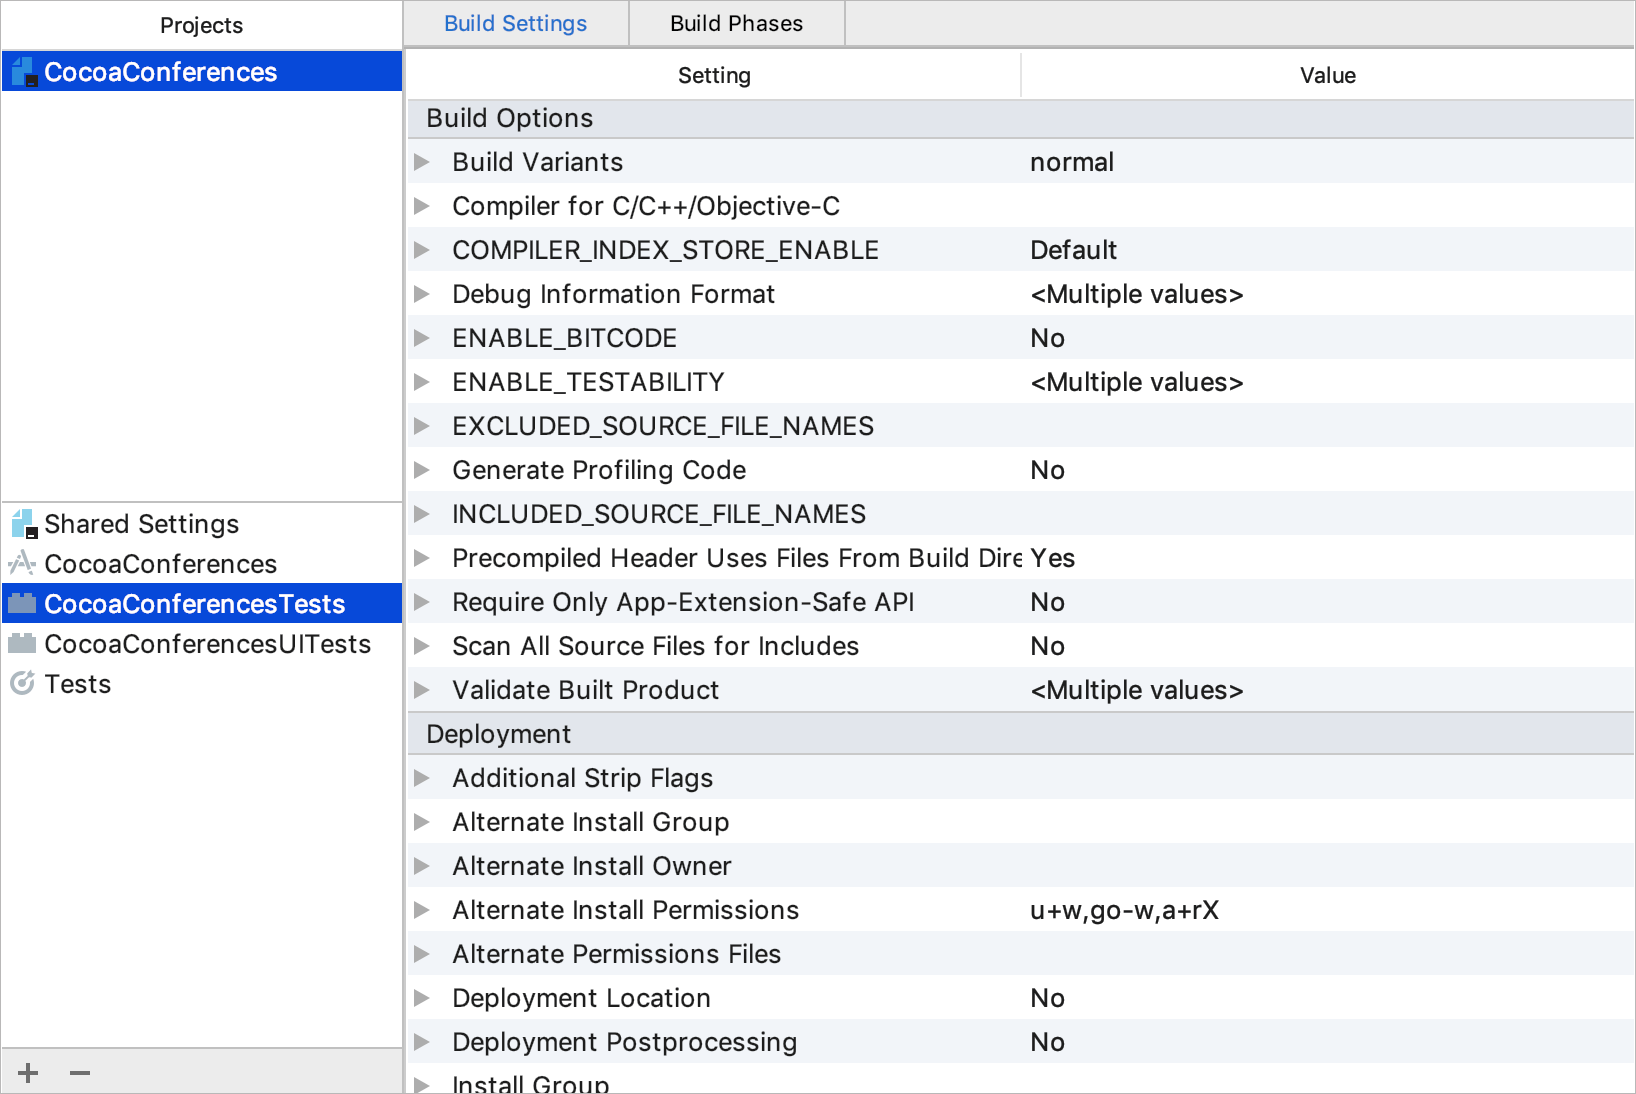 Xcode-compatible project settings - Help | AppCode